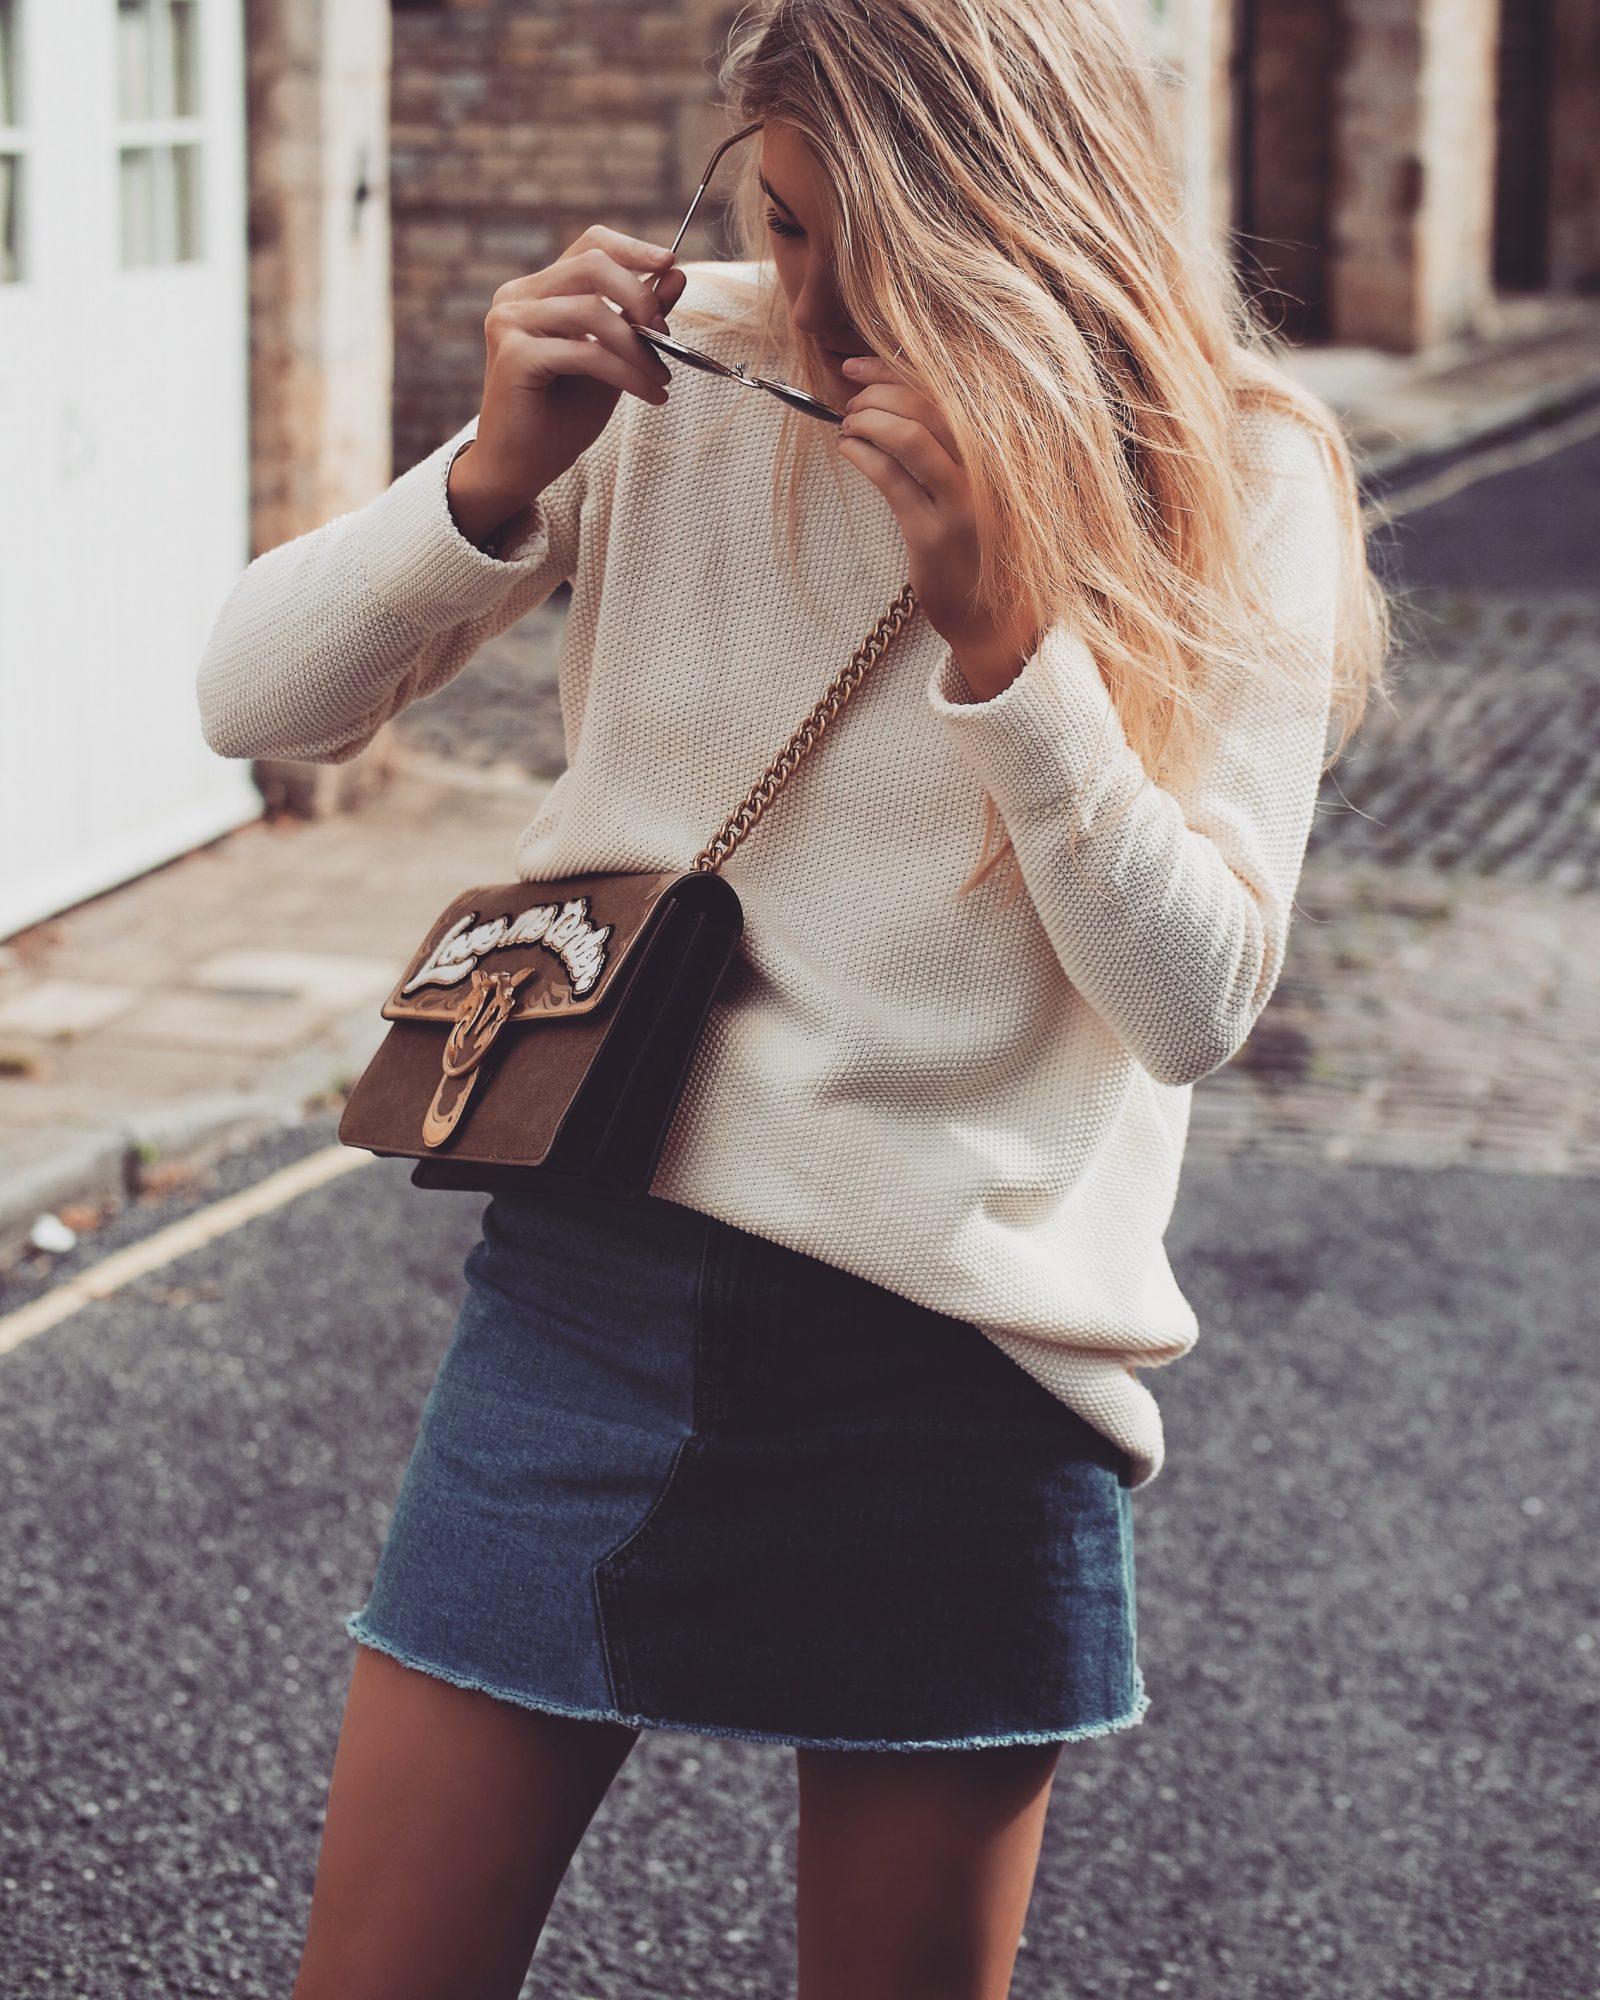 Lacoste Pinko Love Bag